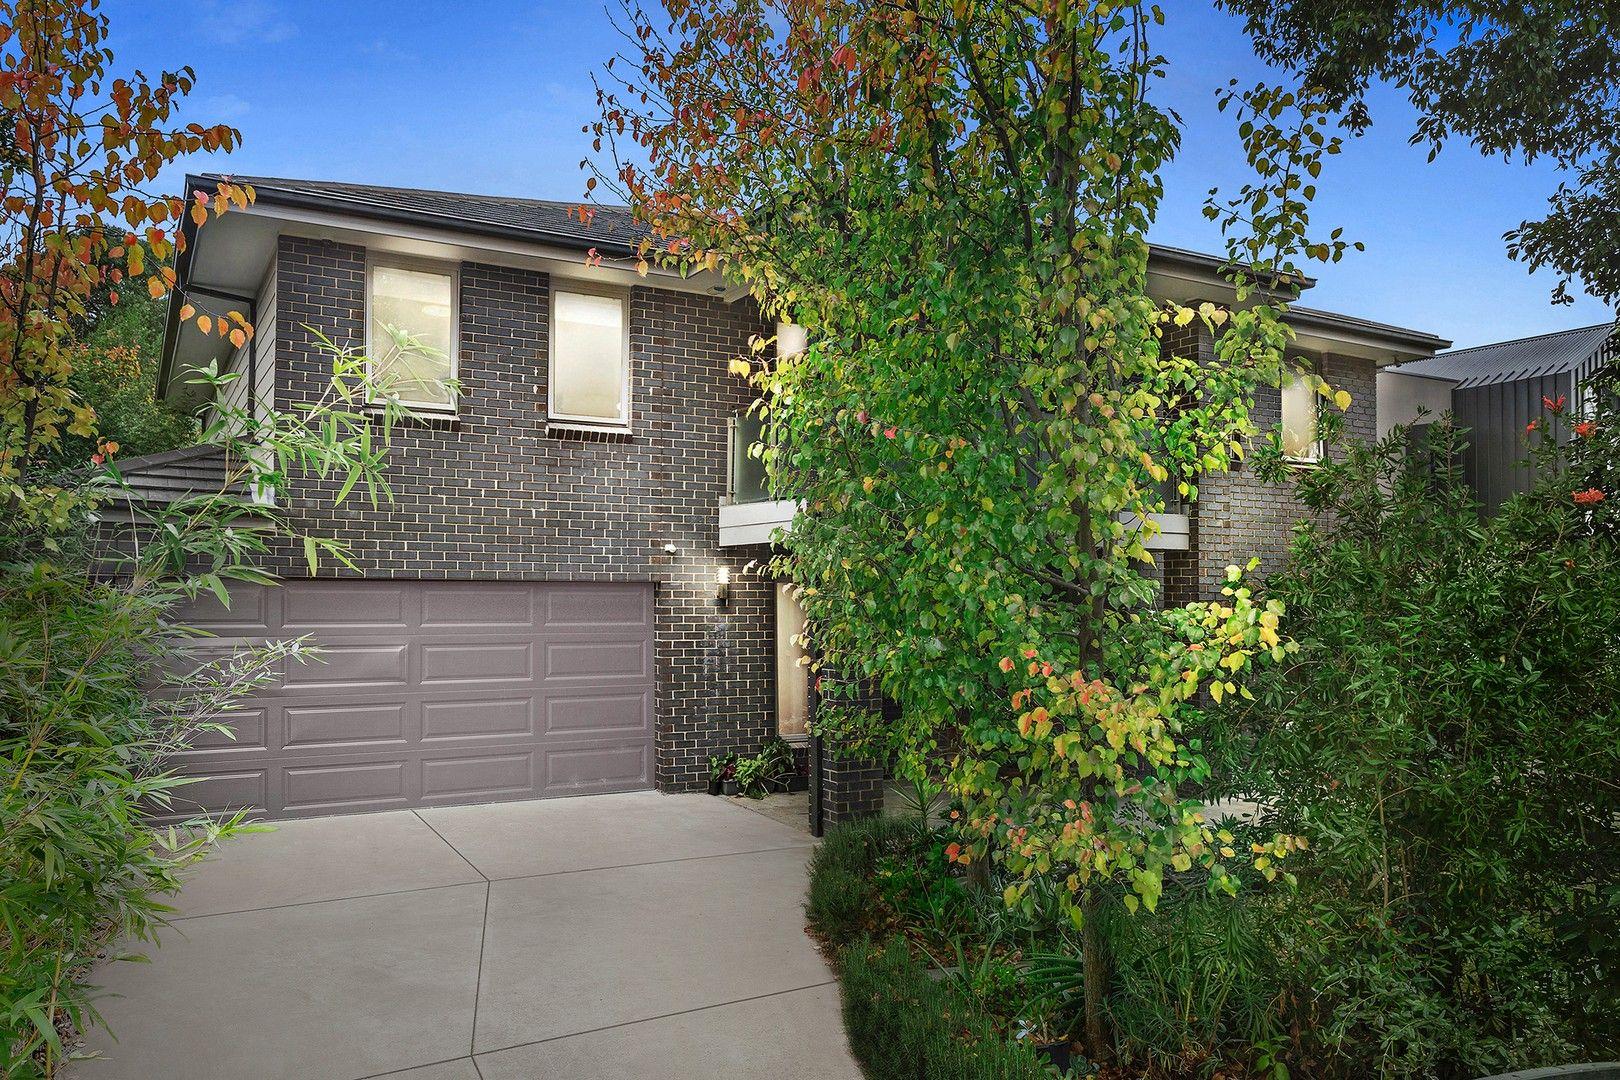 53 Munro Avenue, Ashburton VIC 3147, Image 0